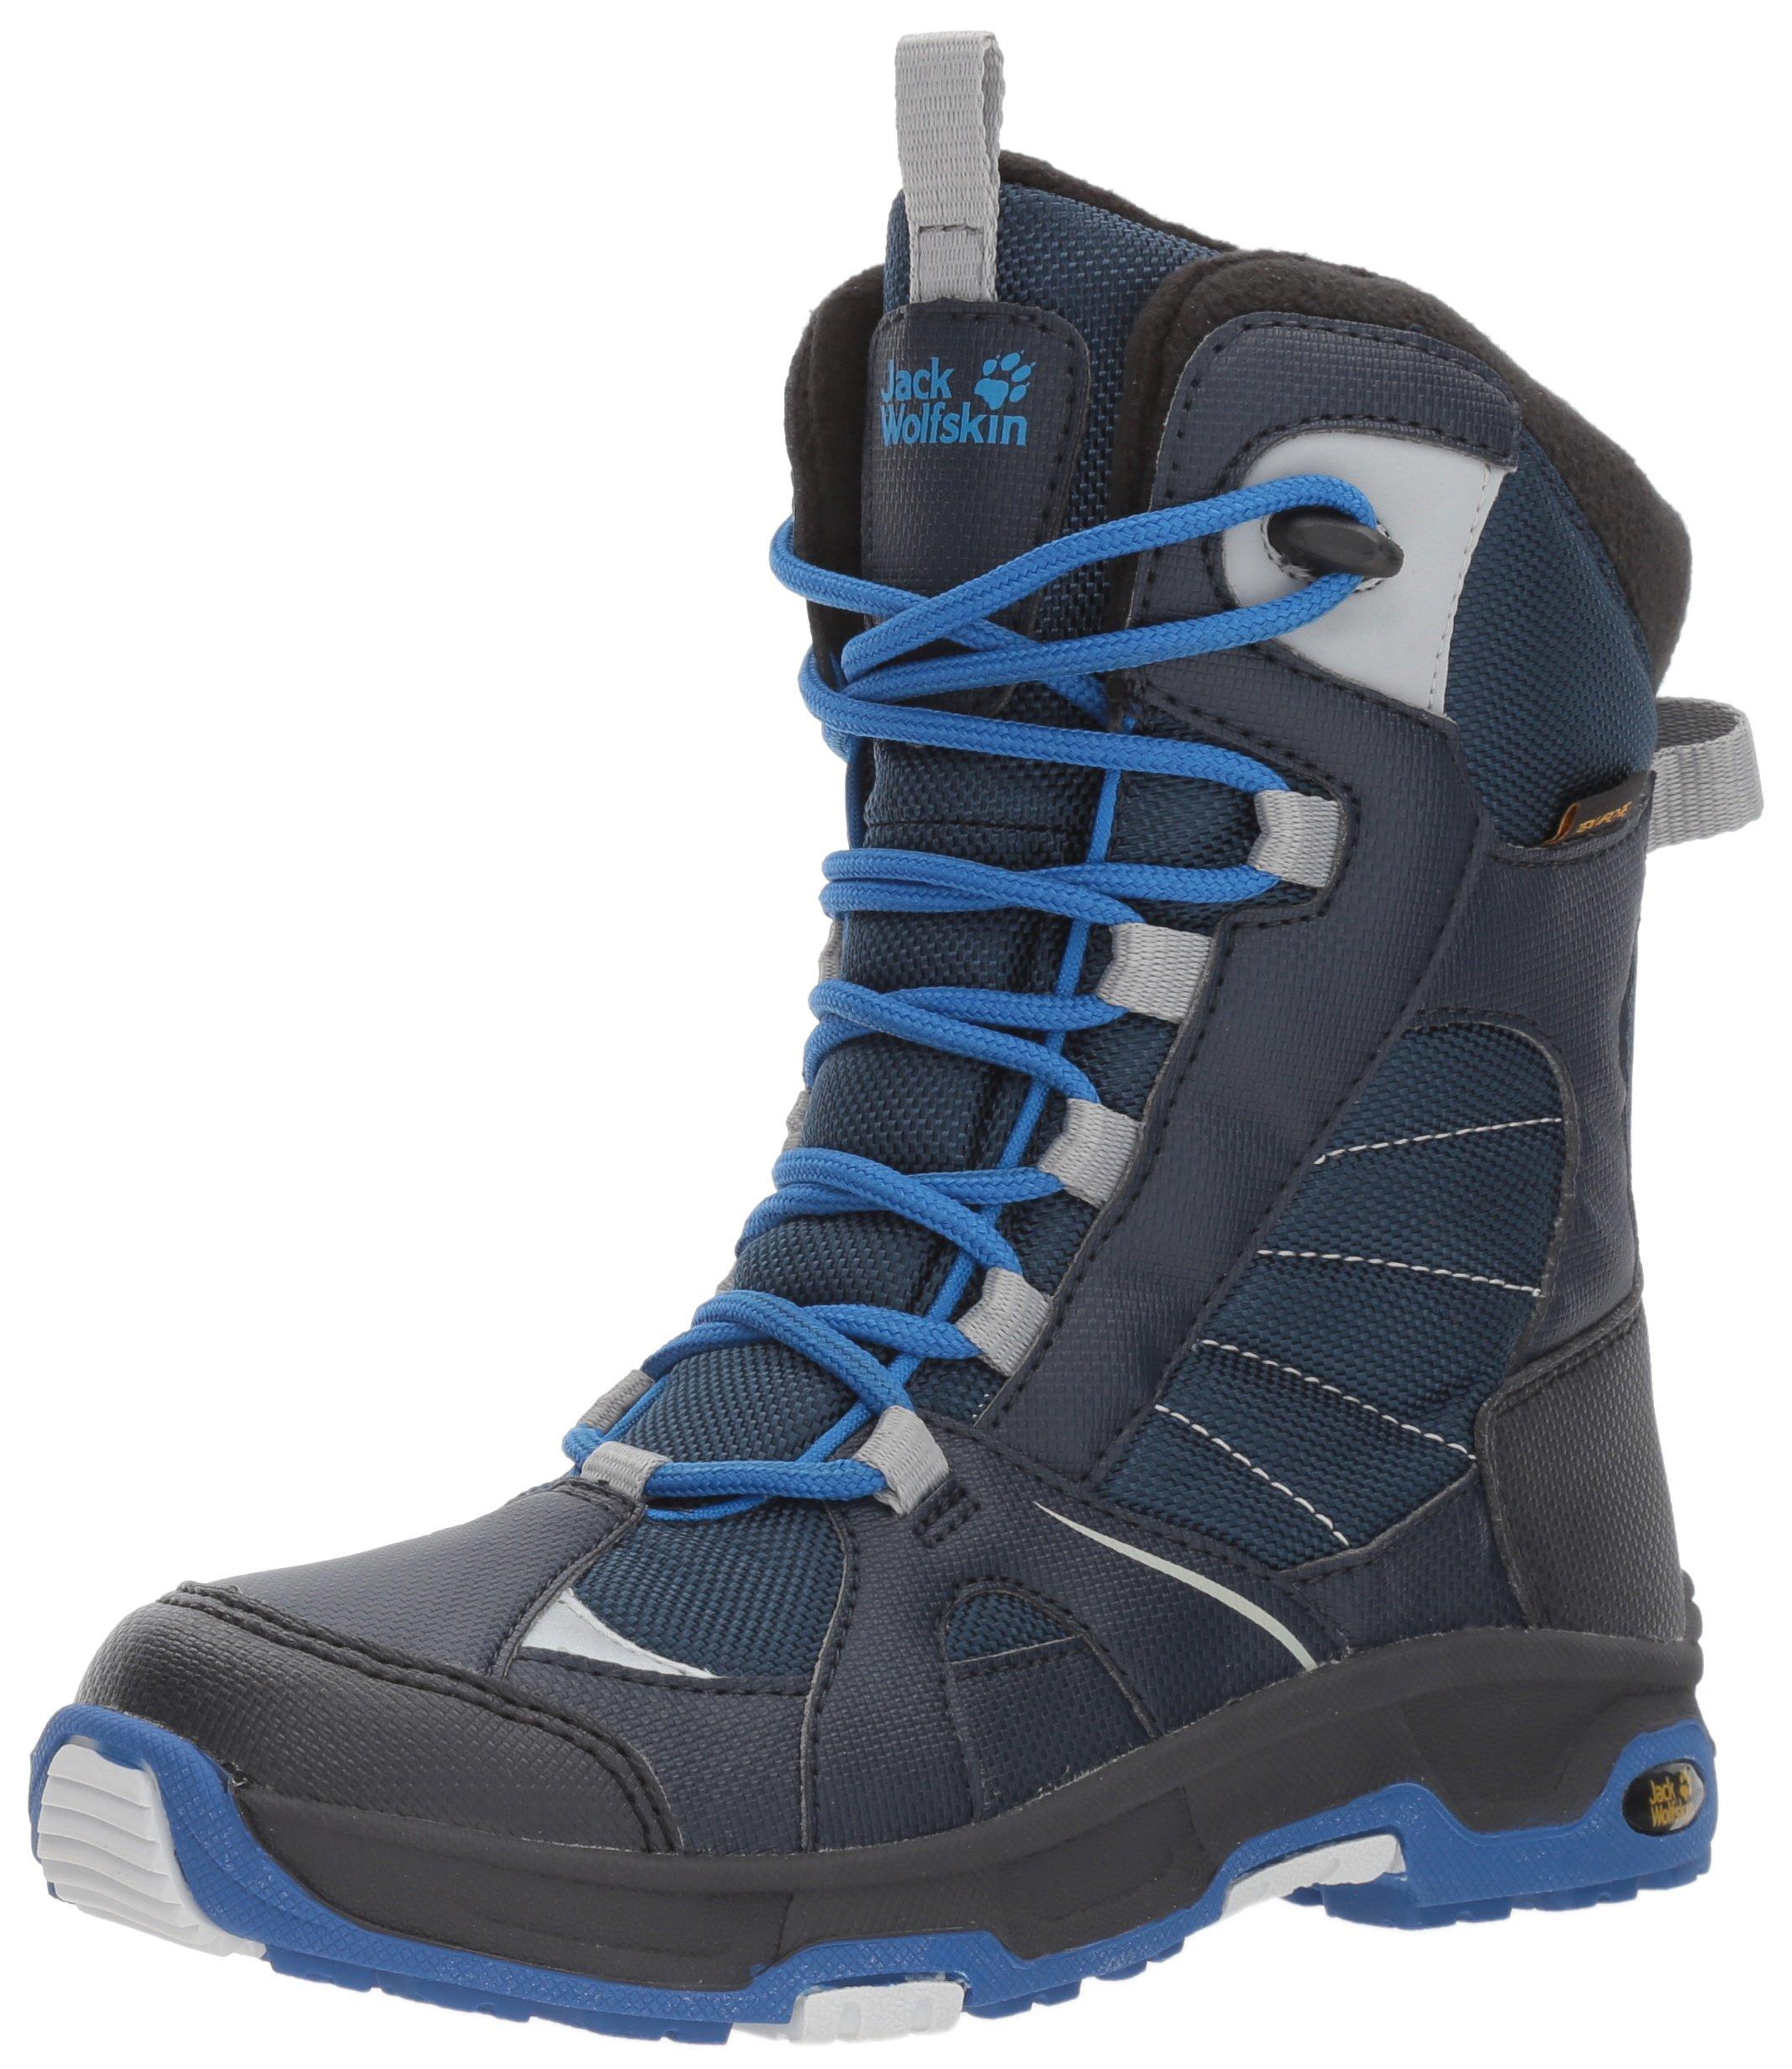 Jack Wolfskin Boys' Ride Texapore Snow Boot, Vibrant Blue, 7.5 M US Big Kid